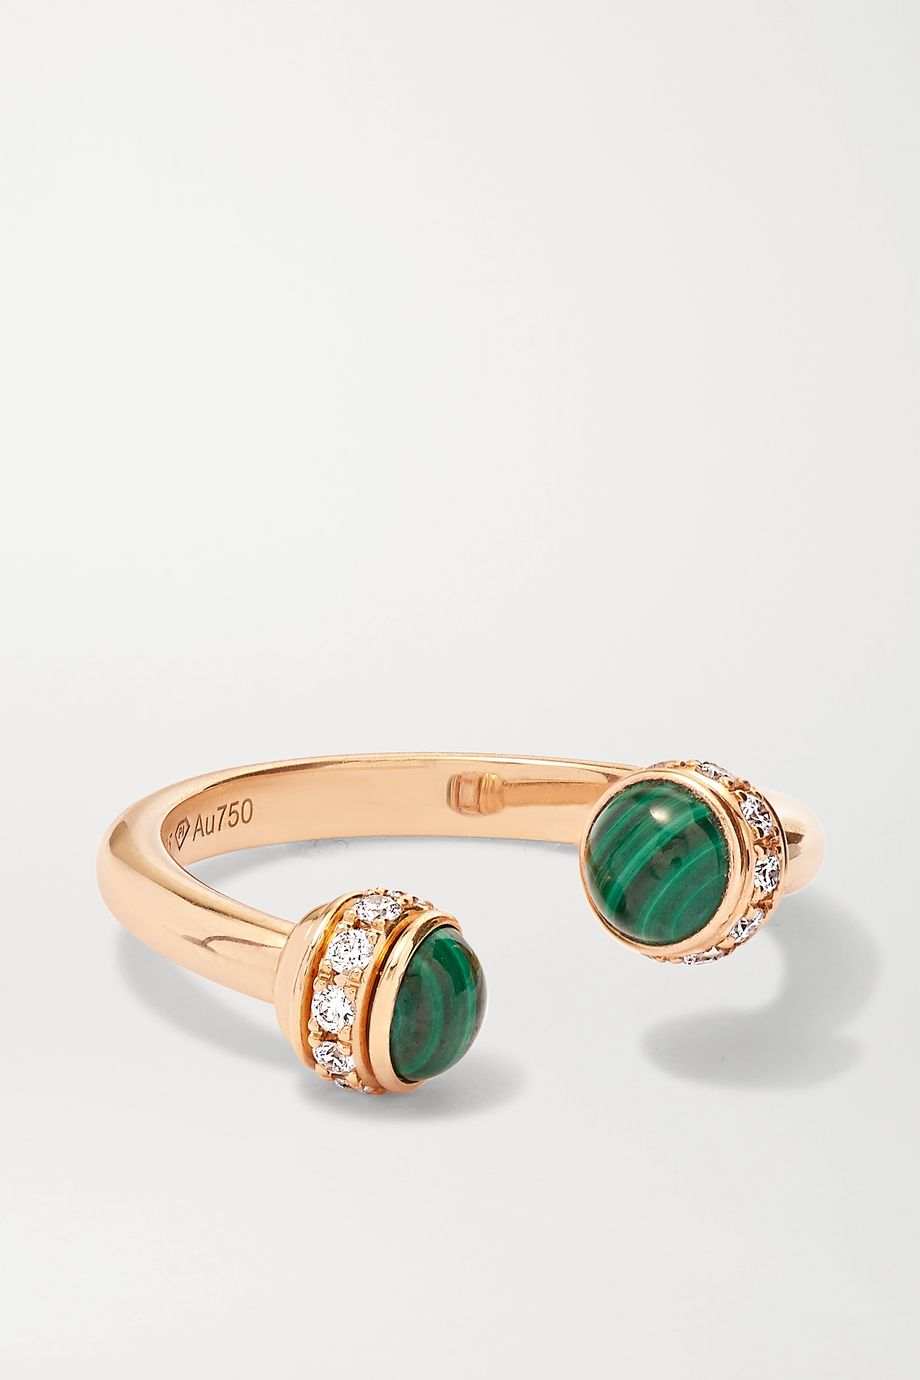 Piaget Possession 18-karat rose gold, malachite and diamond ring